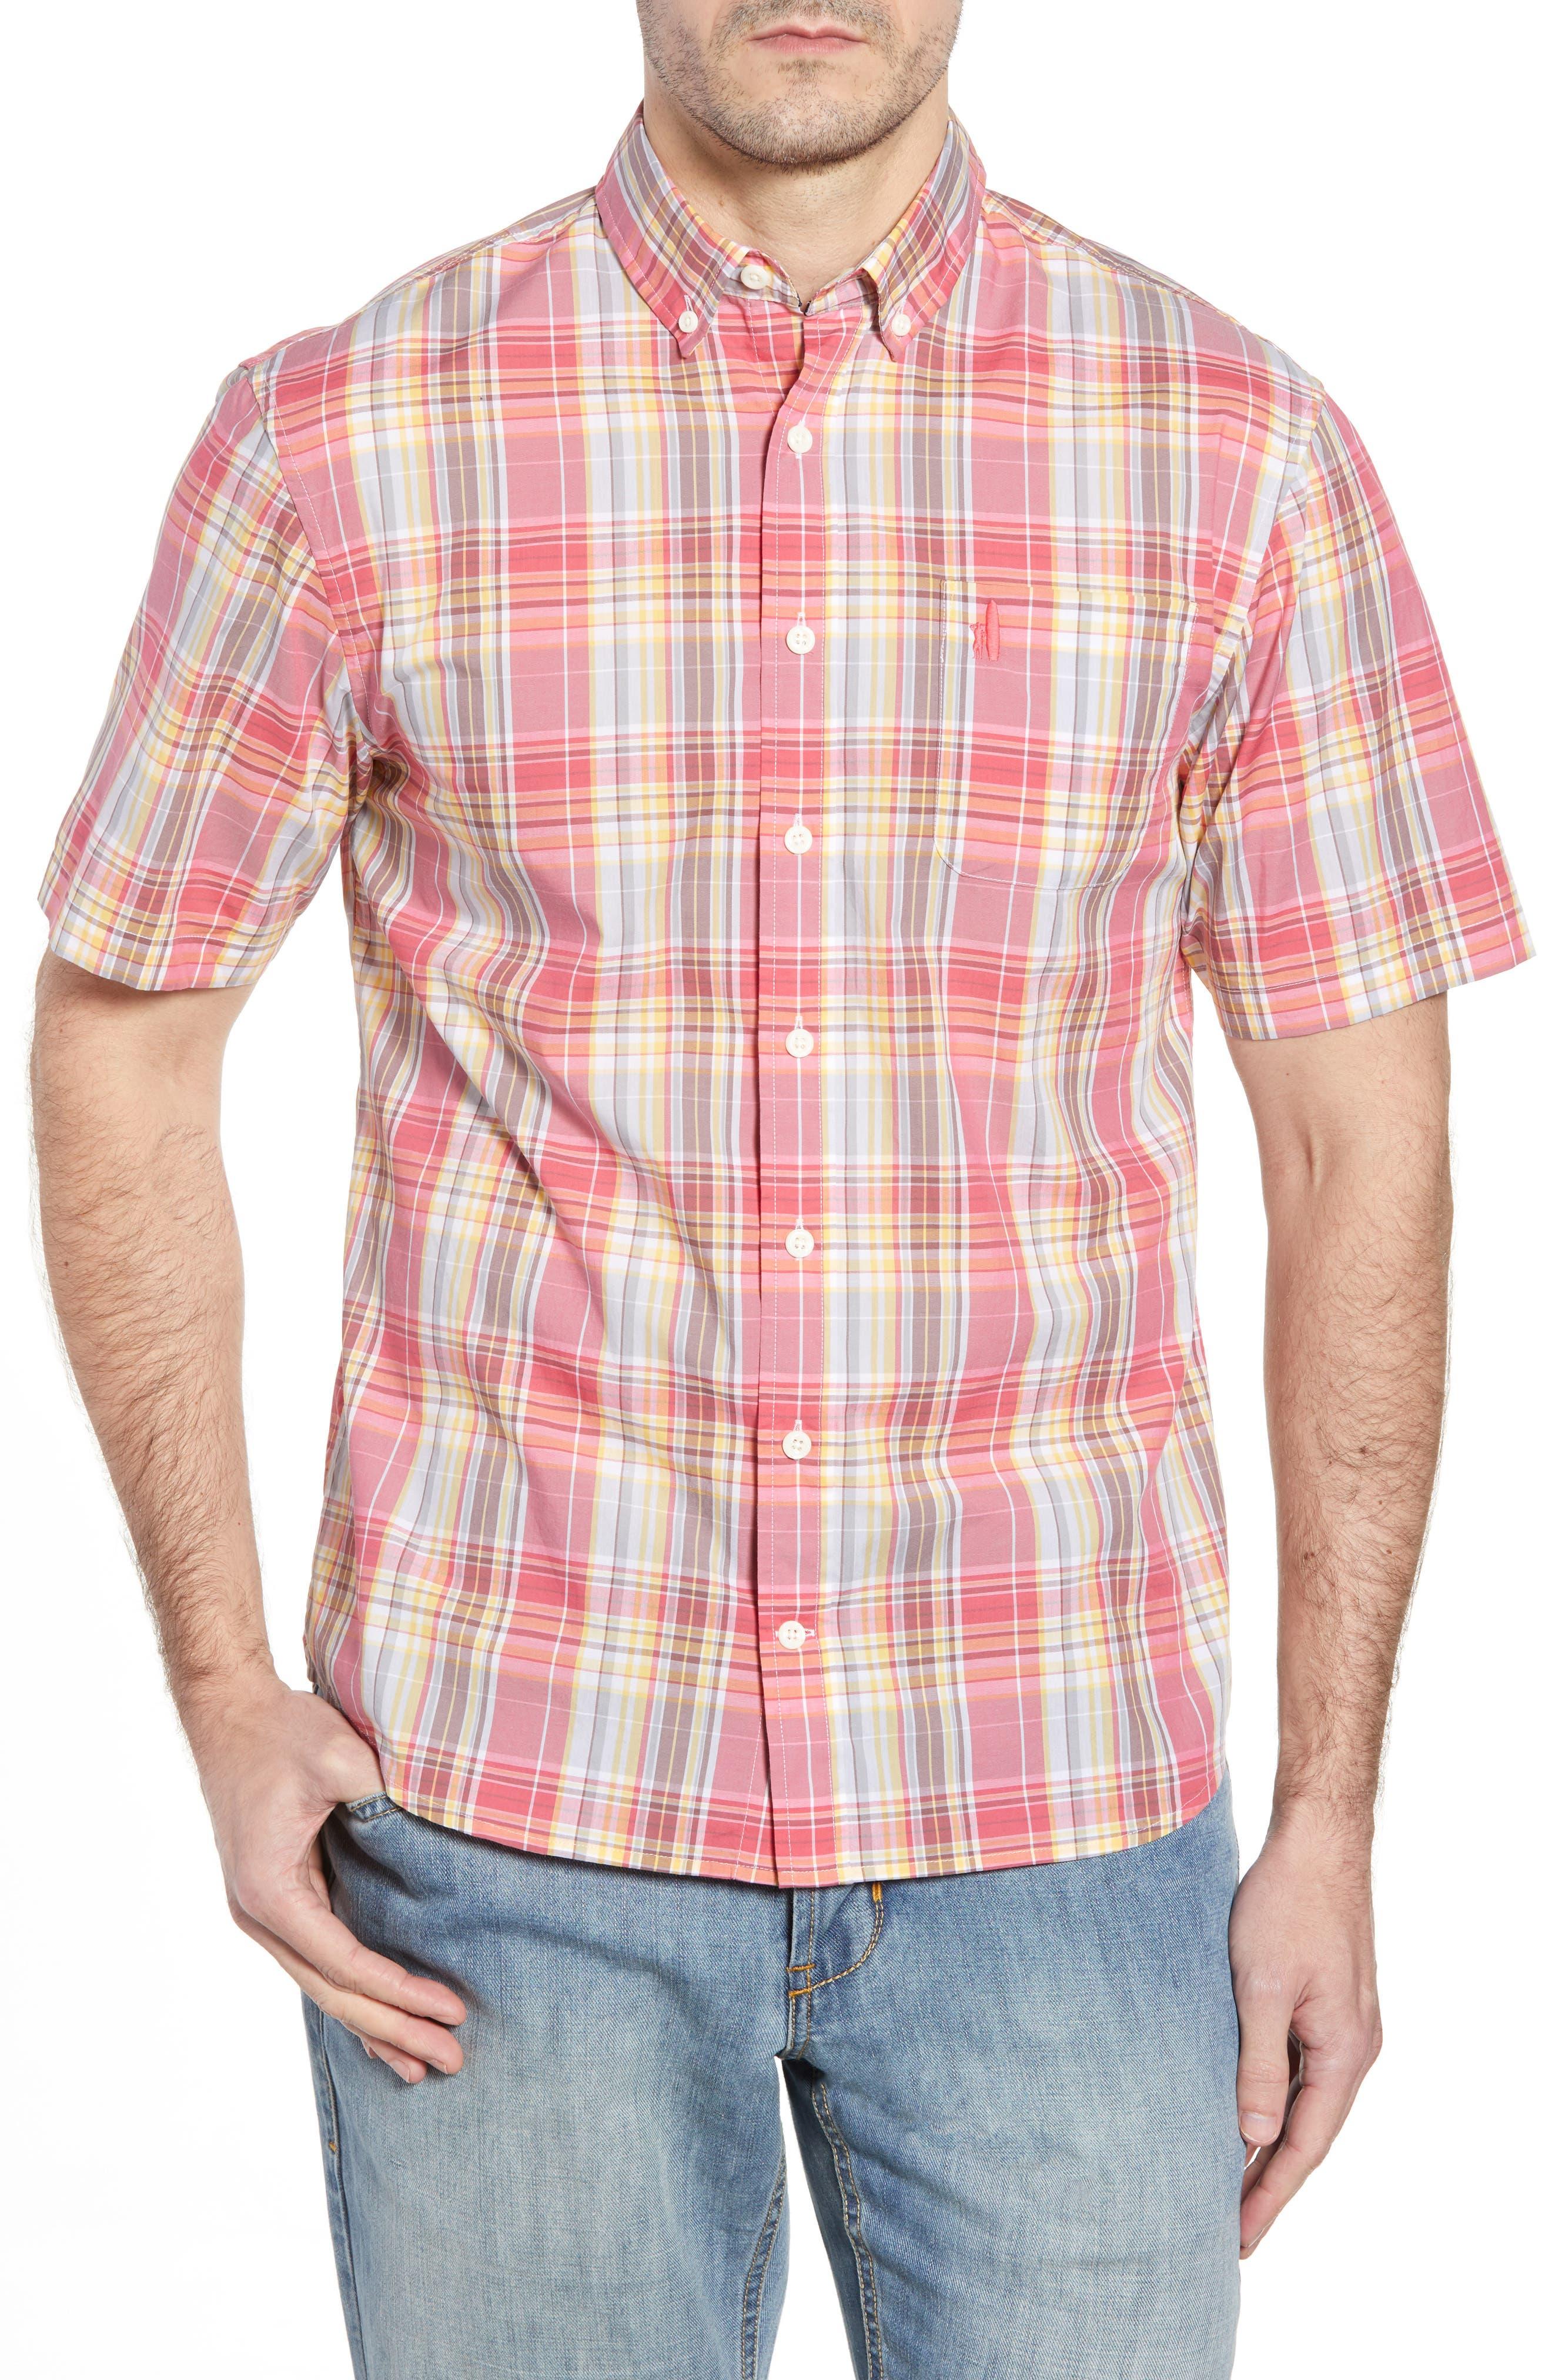 Glenn Classic Fit Plaid Sport Shirt,                             Main thumbnail 1, color,                             Calypso